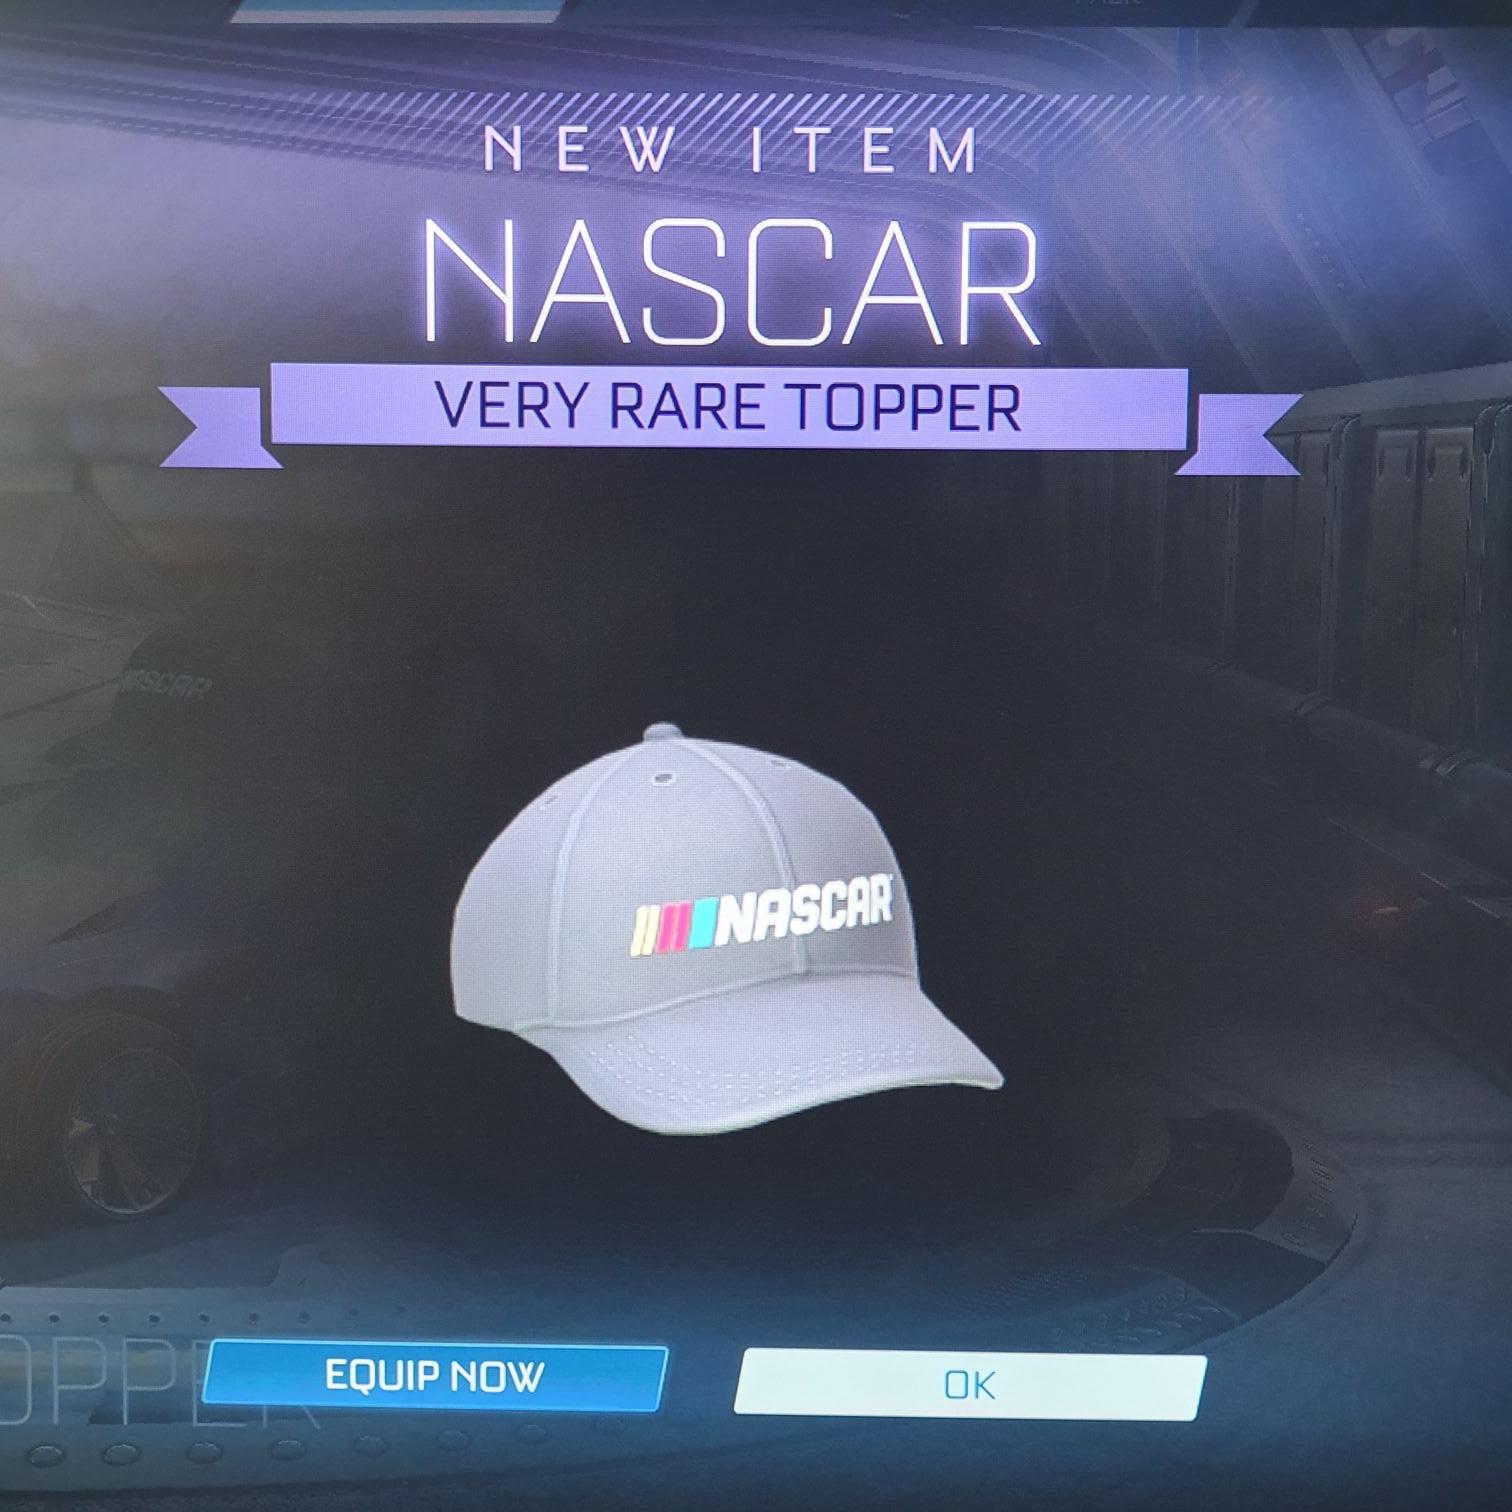 Gratis Nascar Pet in Rocket League